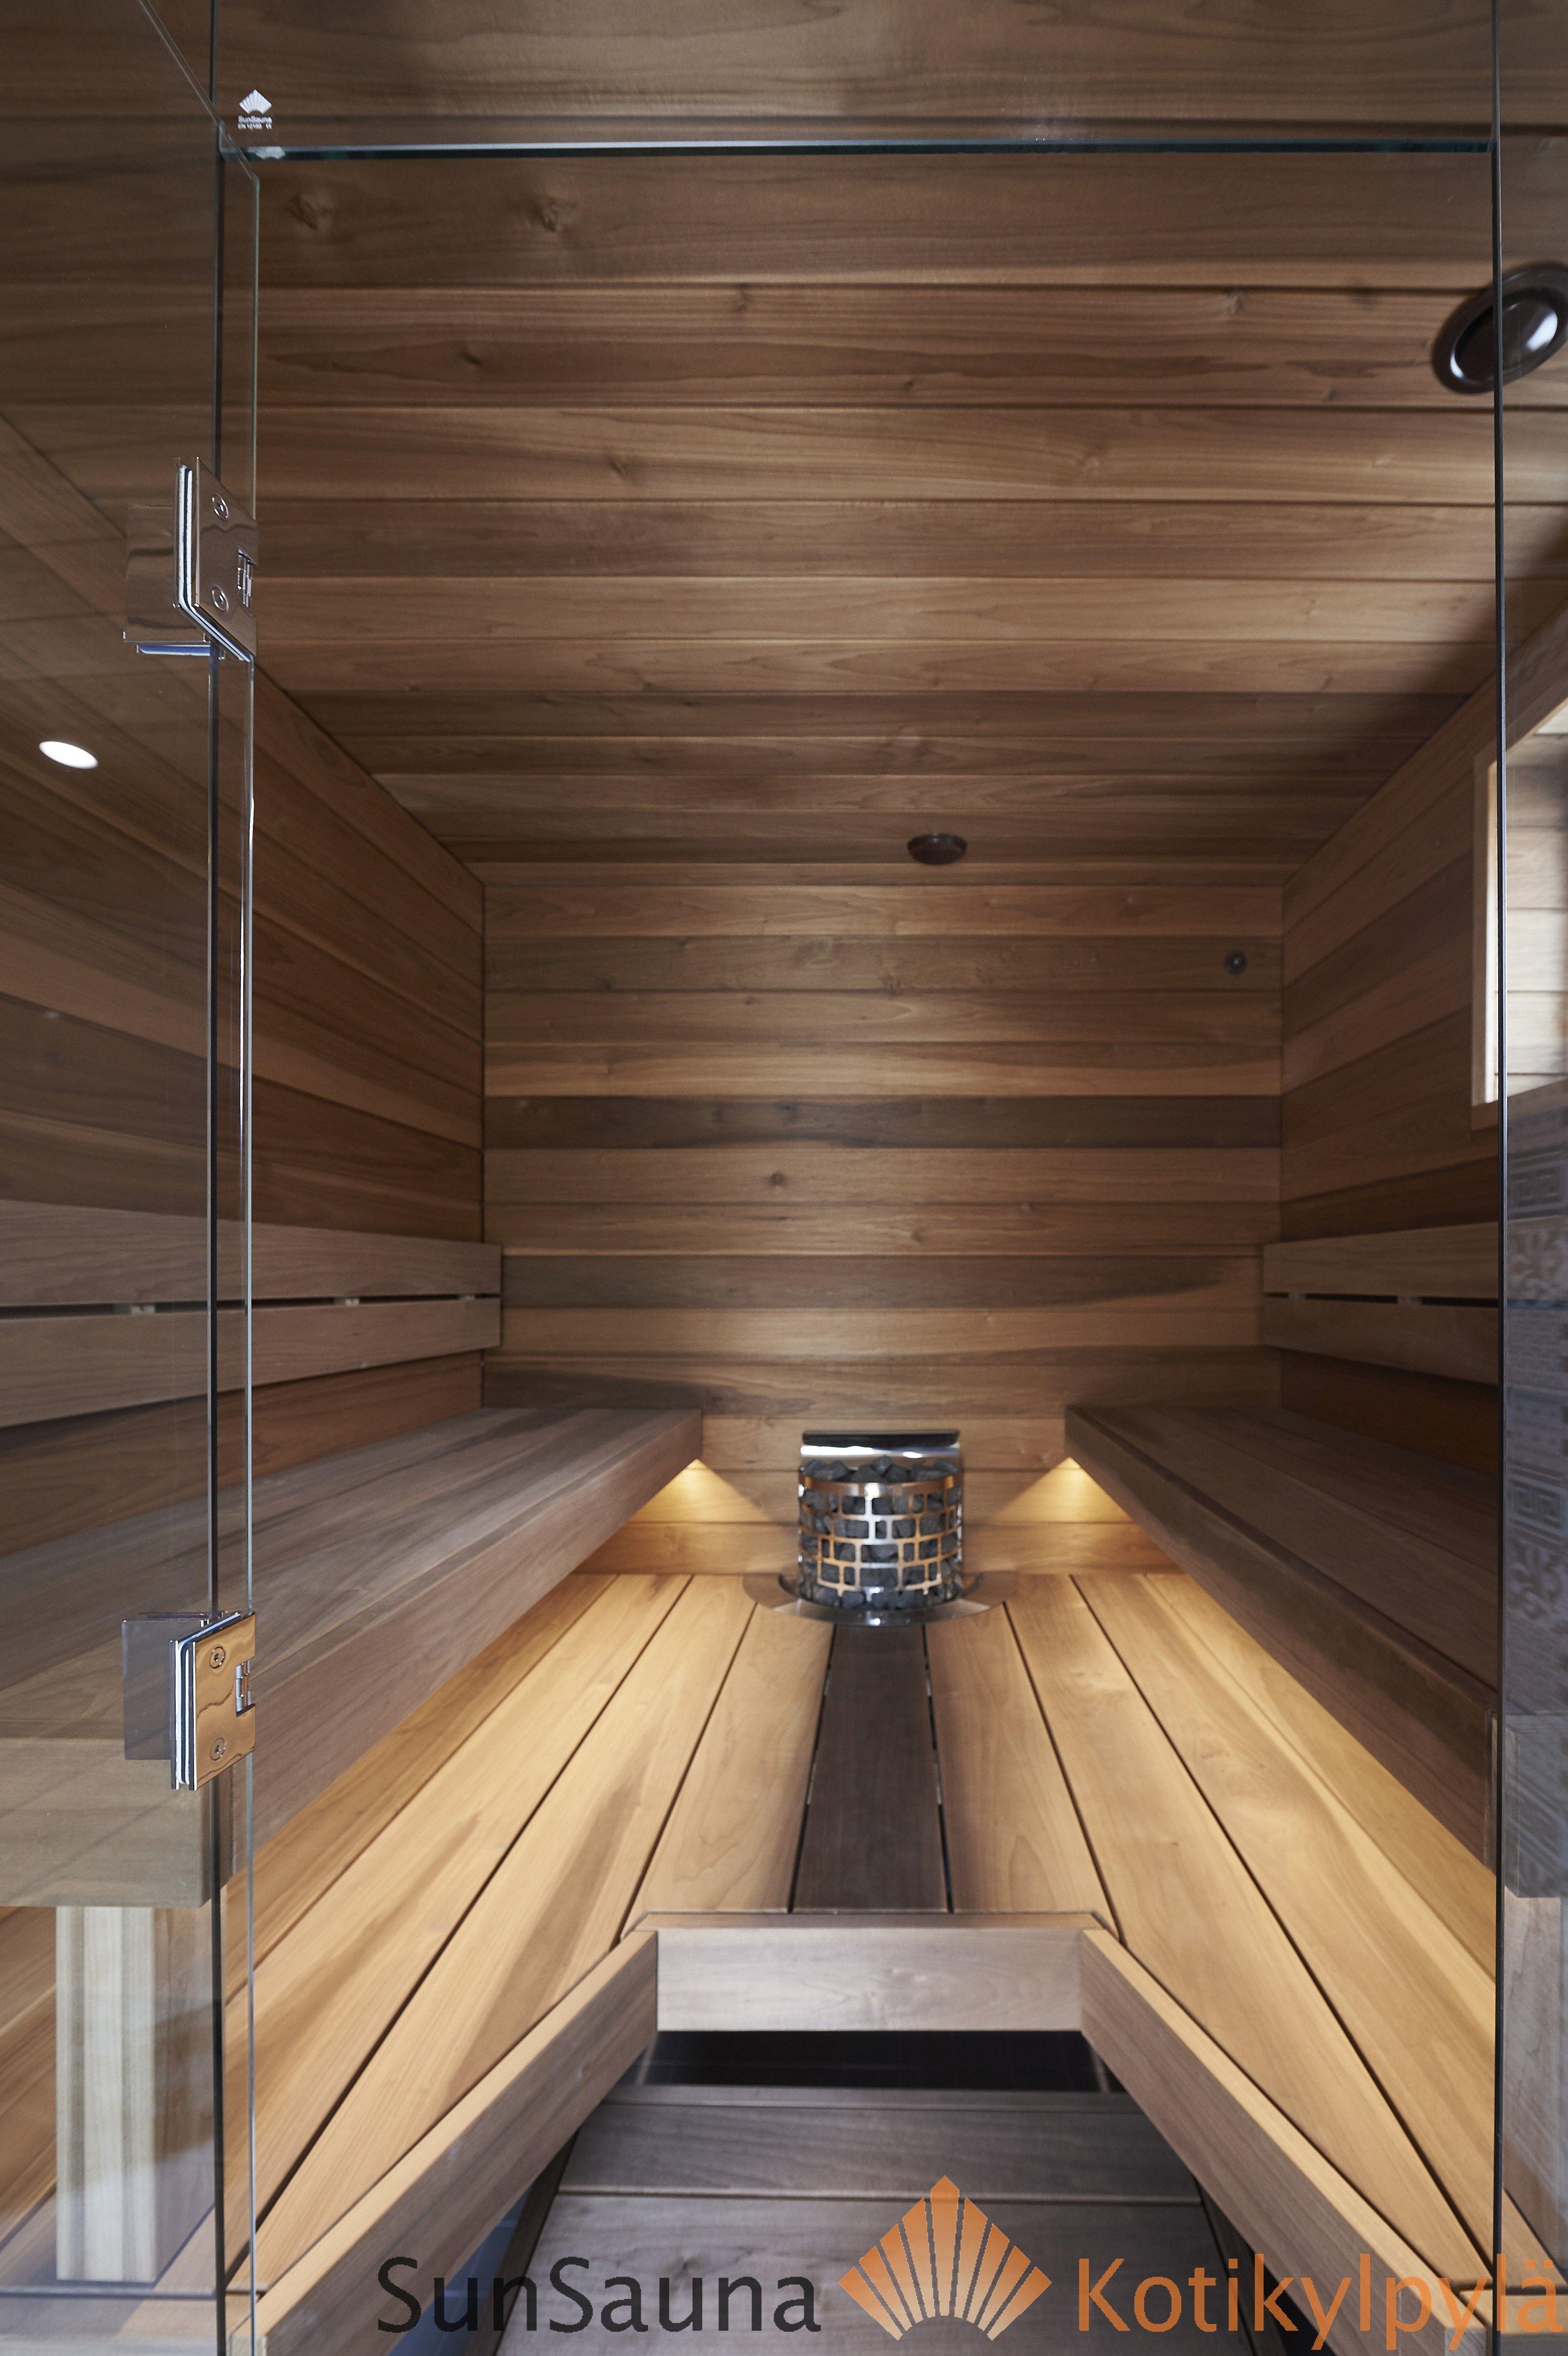 Radiant Saunas Rejuvenator Portable Sauna Reviews Will Help You Choose Wisely Kurmittelhaus Sauna Ideen Saunahaus